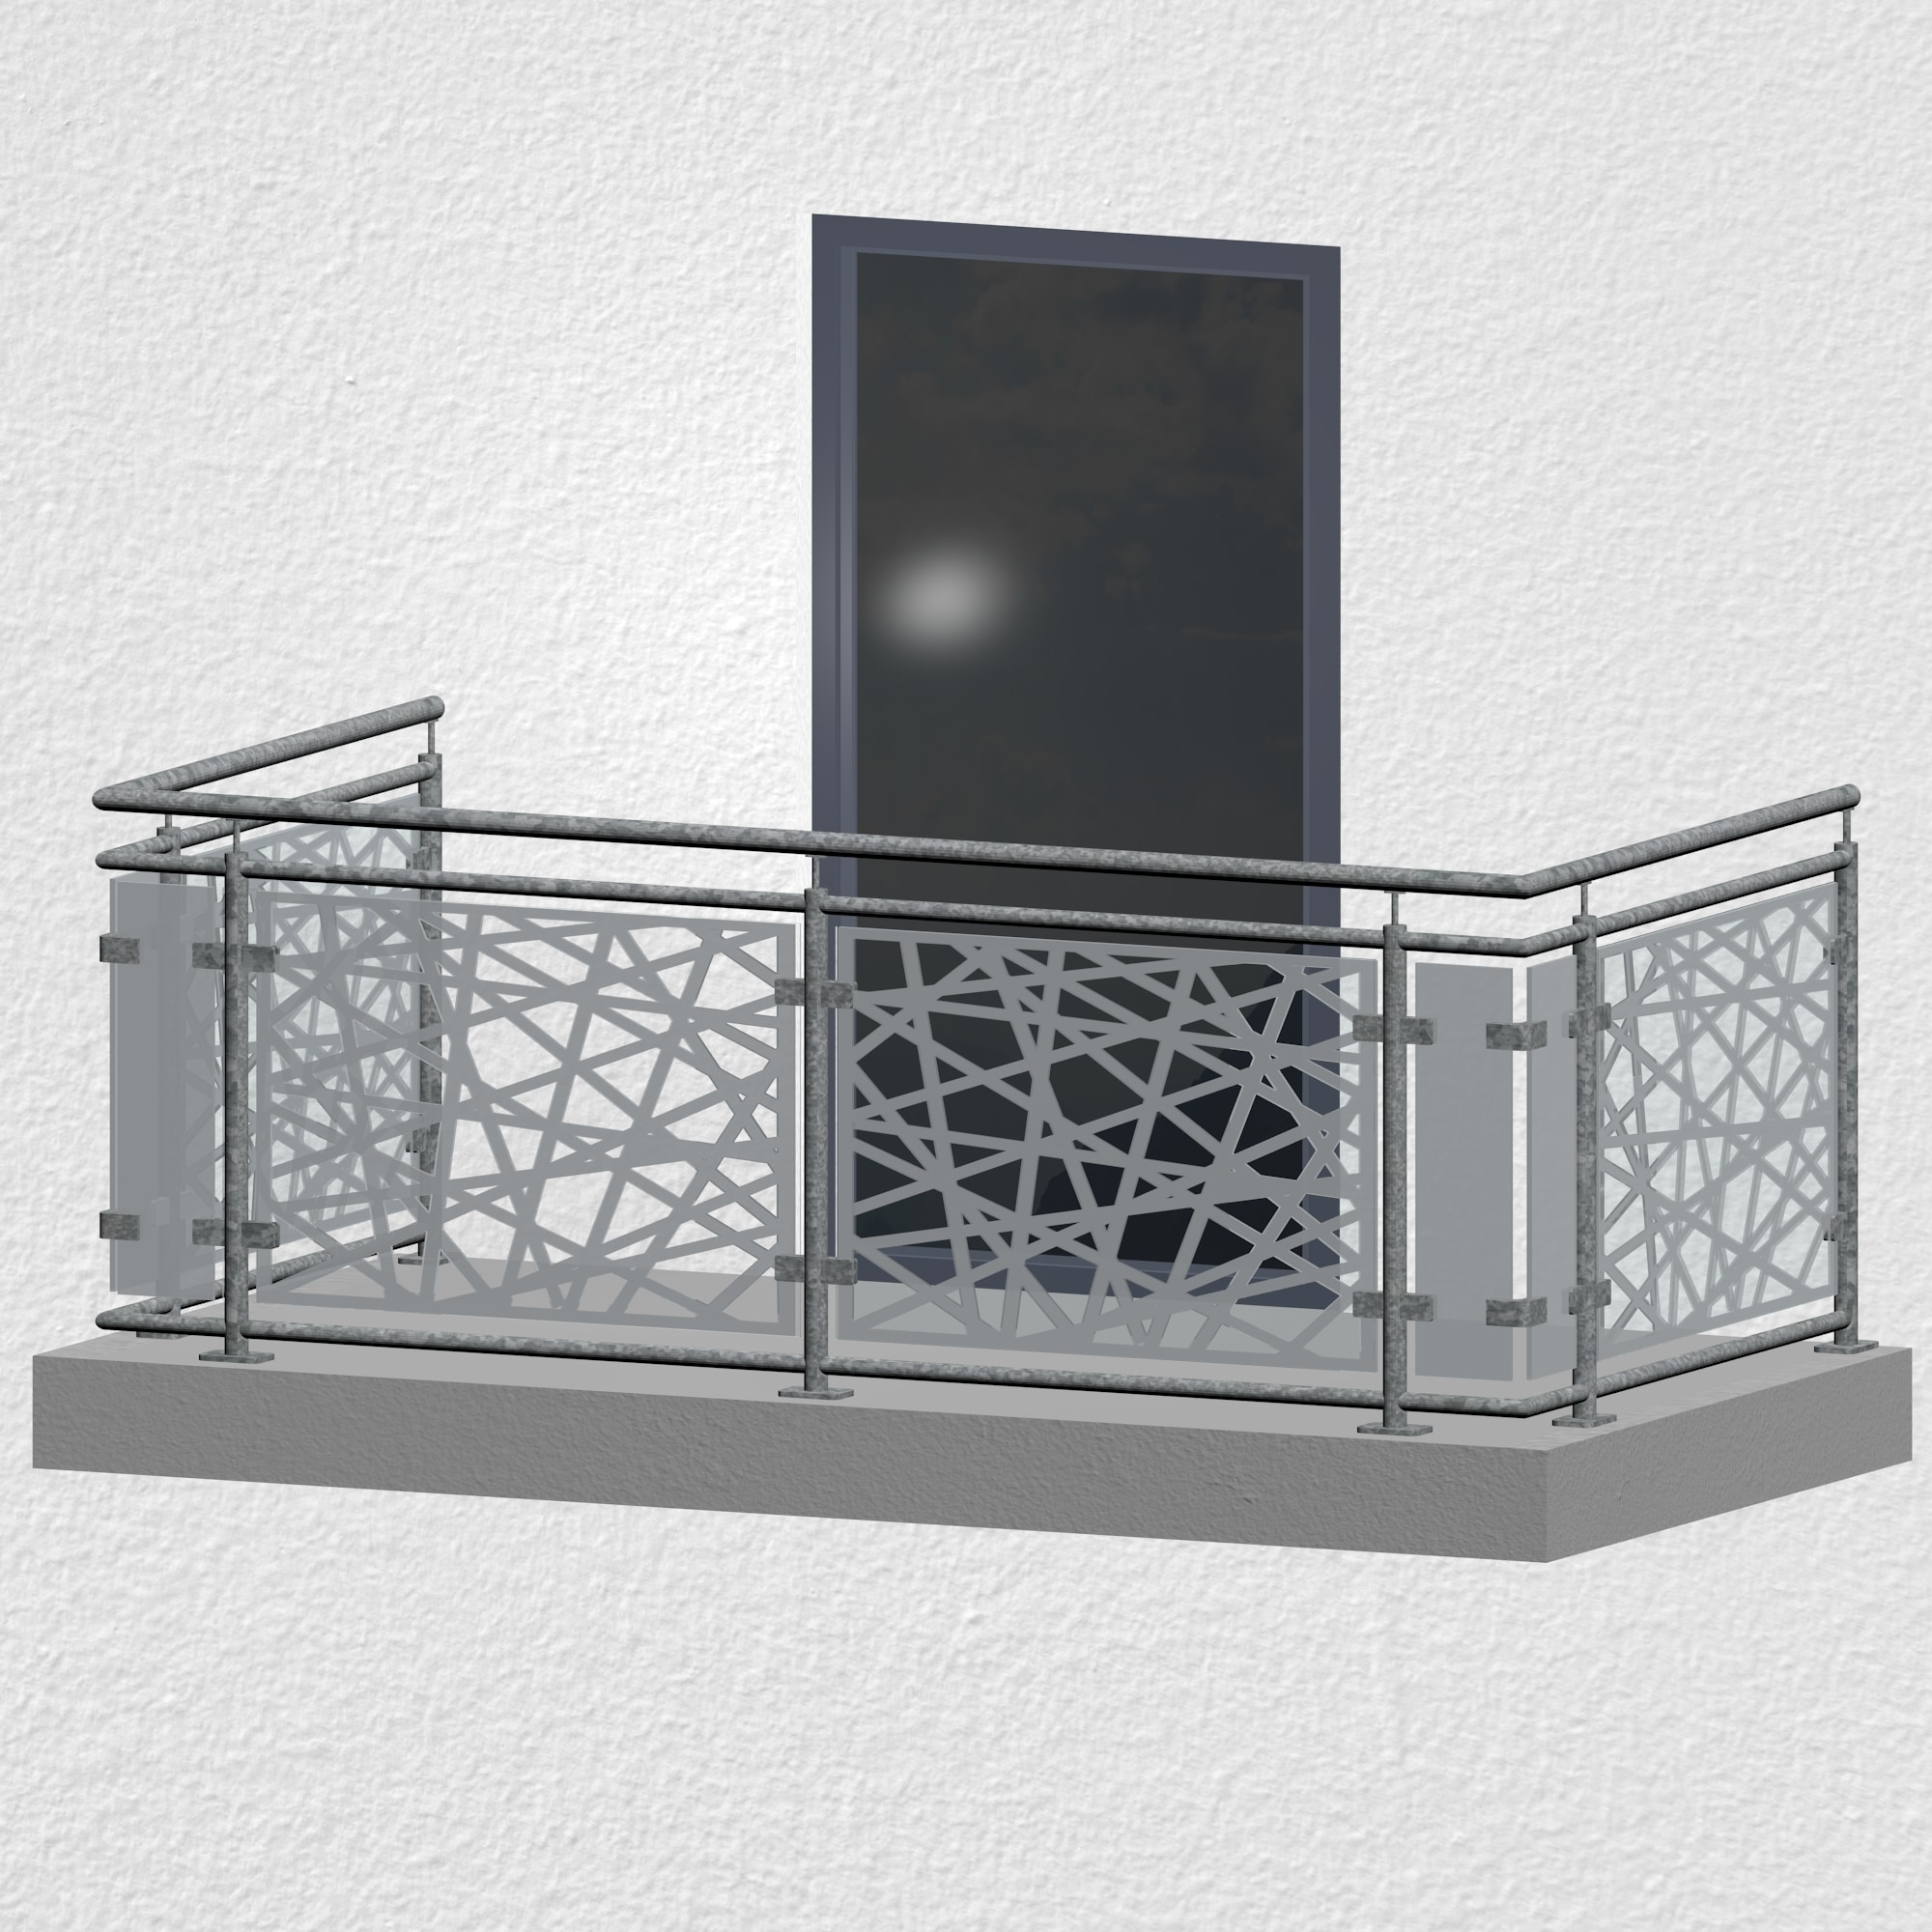 Balkongeländer verzinkt Designglas AB 1